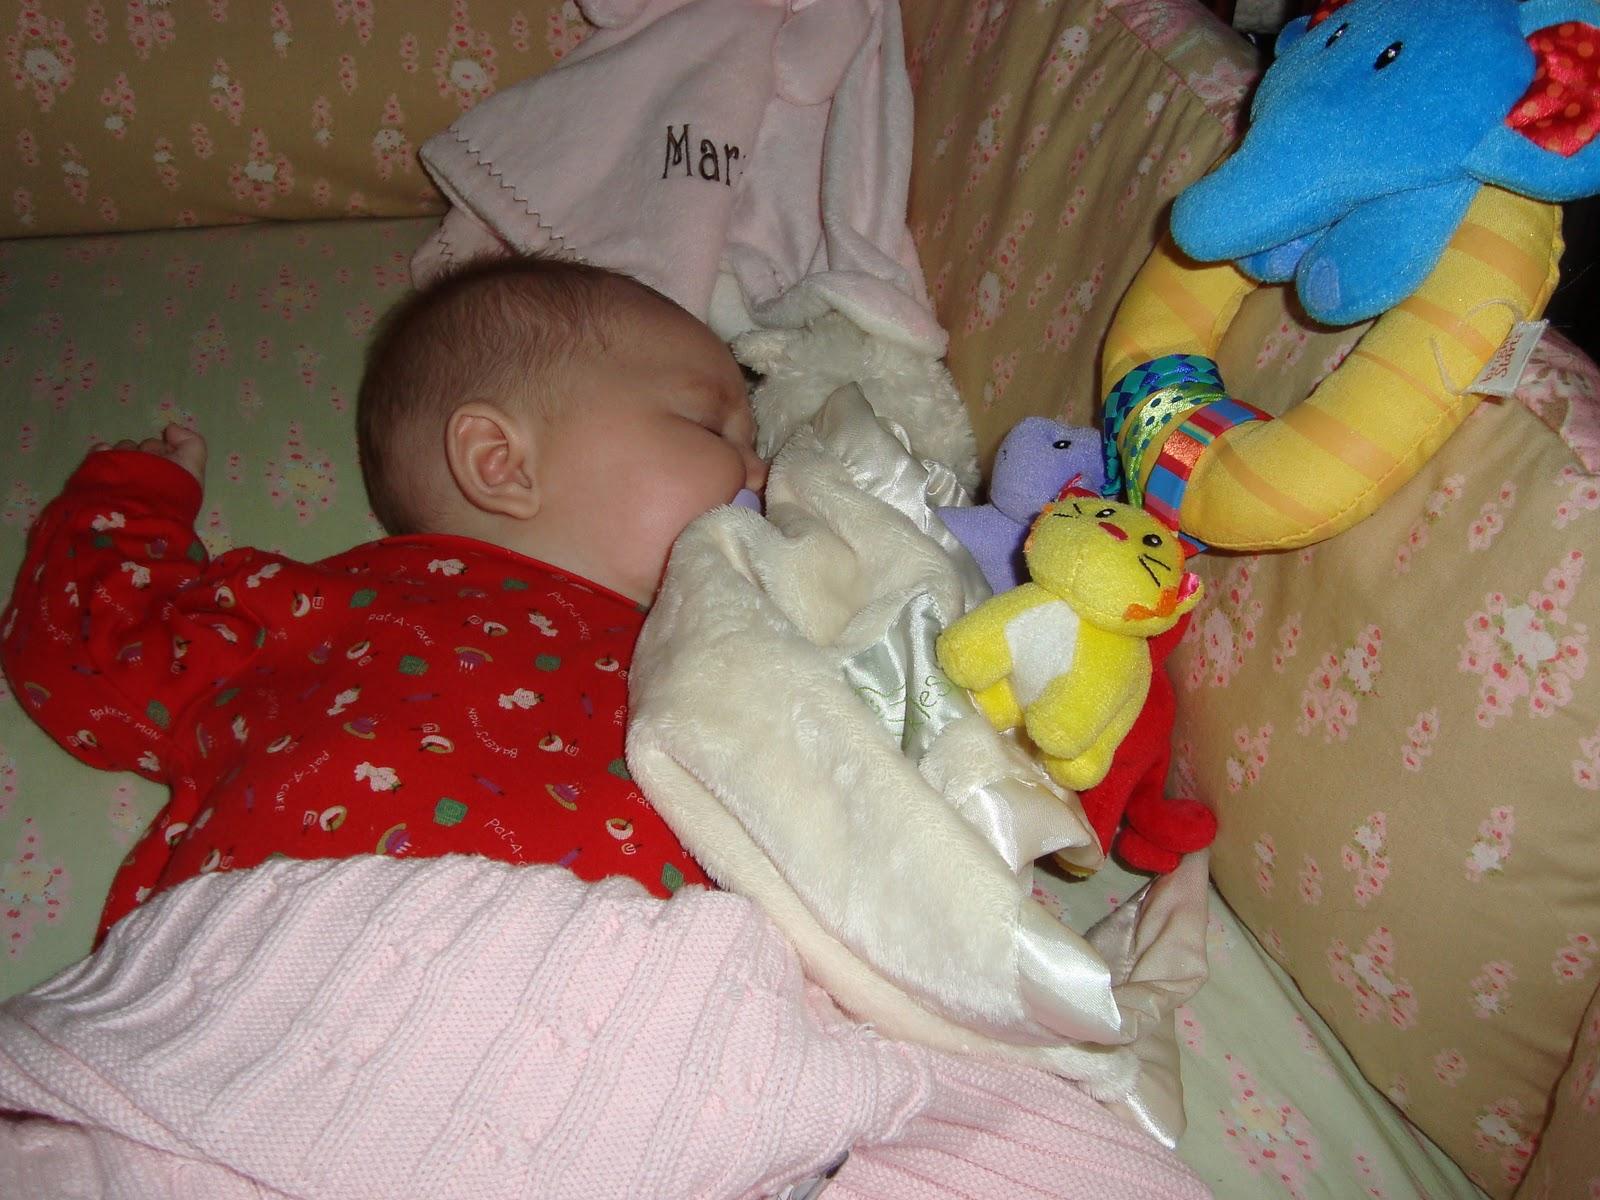 http://2.bp.blogspot.com/_d3B3i5U5aKY/TRjkRI_1FqI/AAAAAAAAA9U/jC4Exj-slRc/s1600/16+weeks+-+napping.JPG